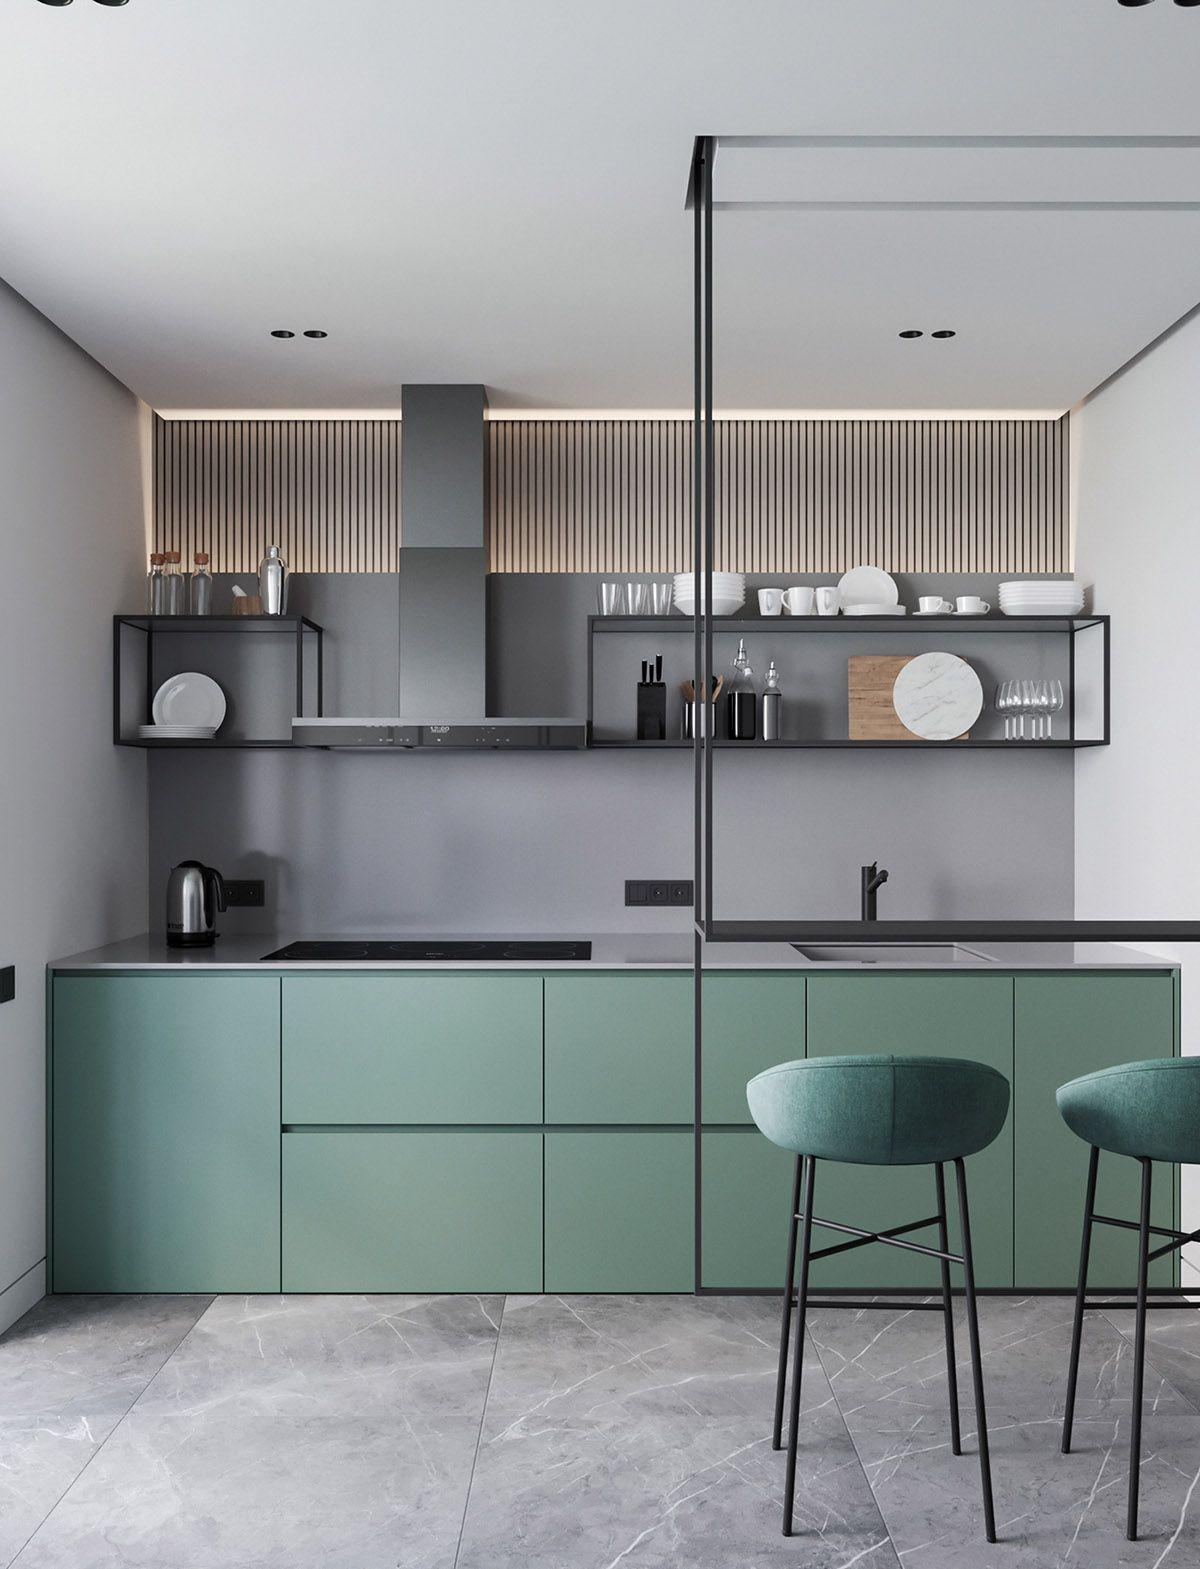 Modern minimalist apartment designs under square meters also best home furniture images in rh pinterest